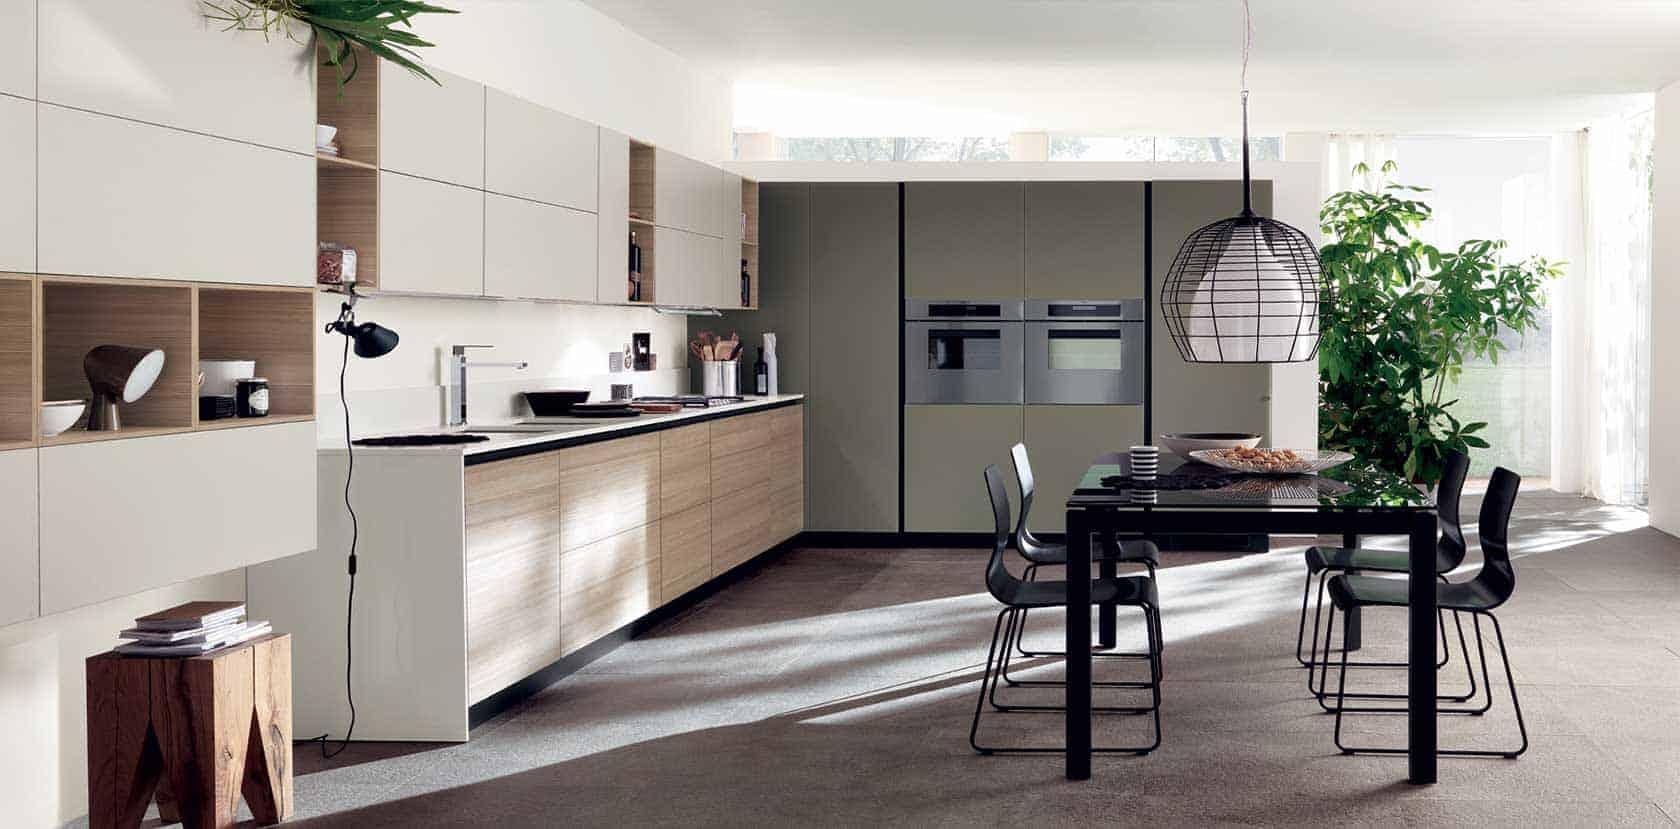 Contemporary kitchens kitchen mart for Contemporary kitchen designs australia